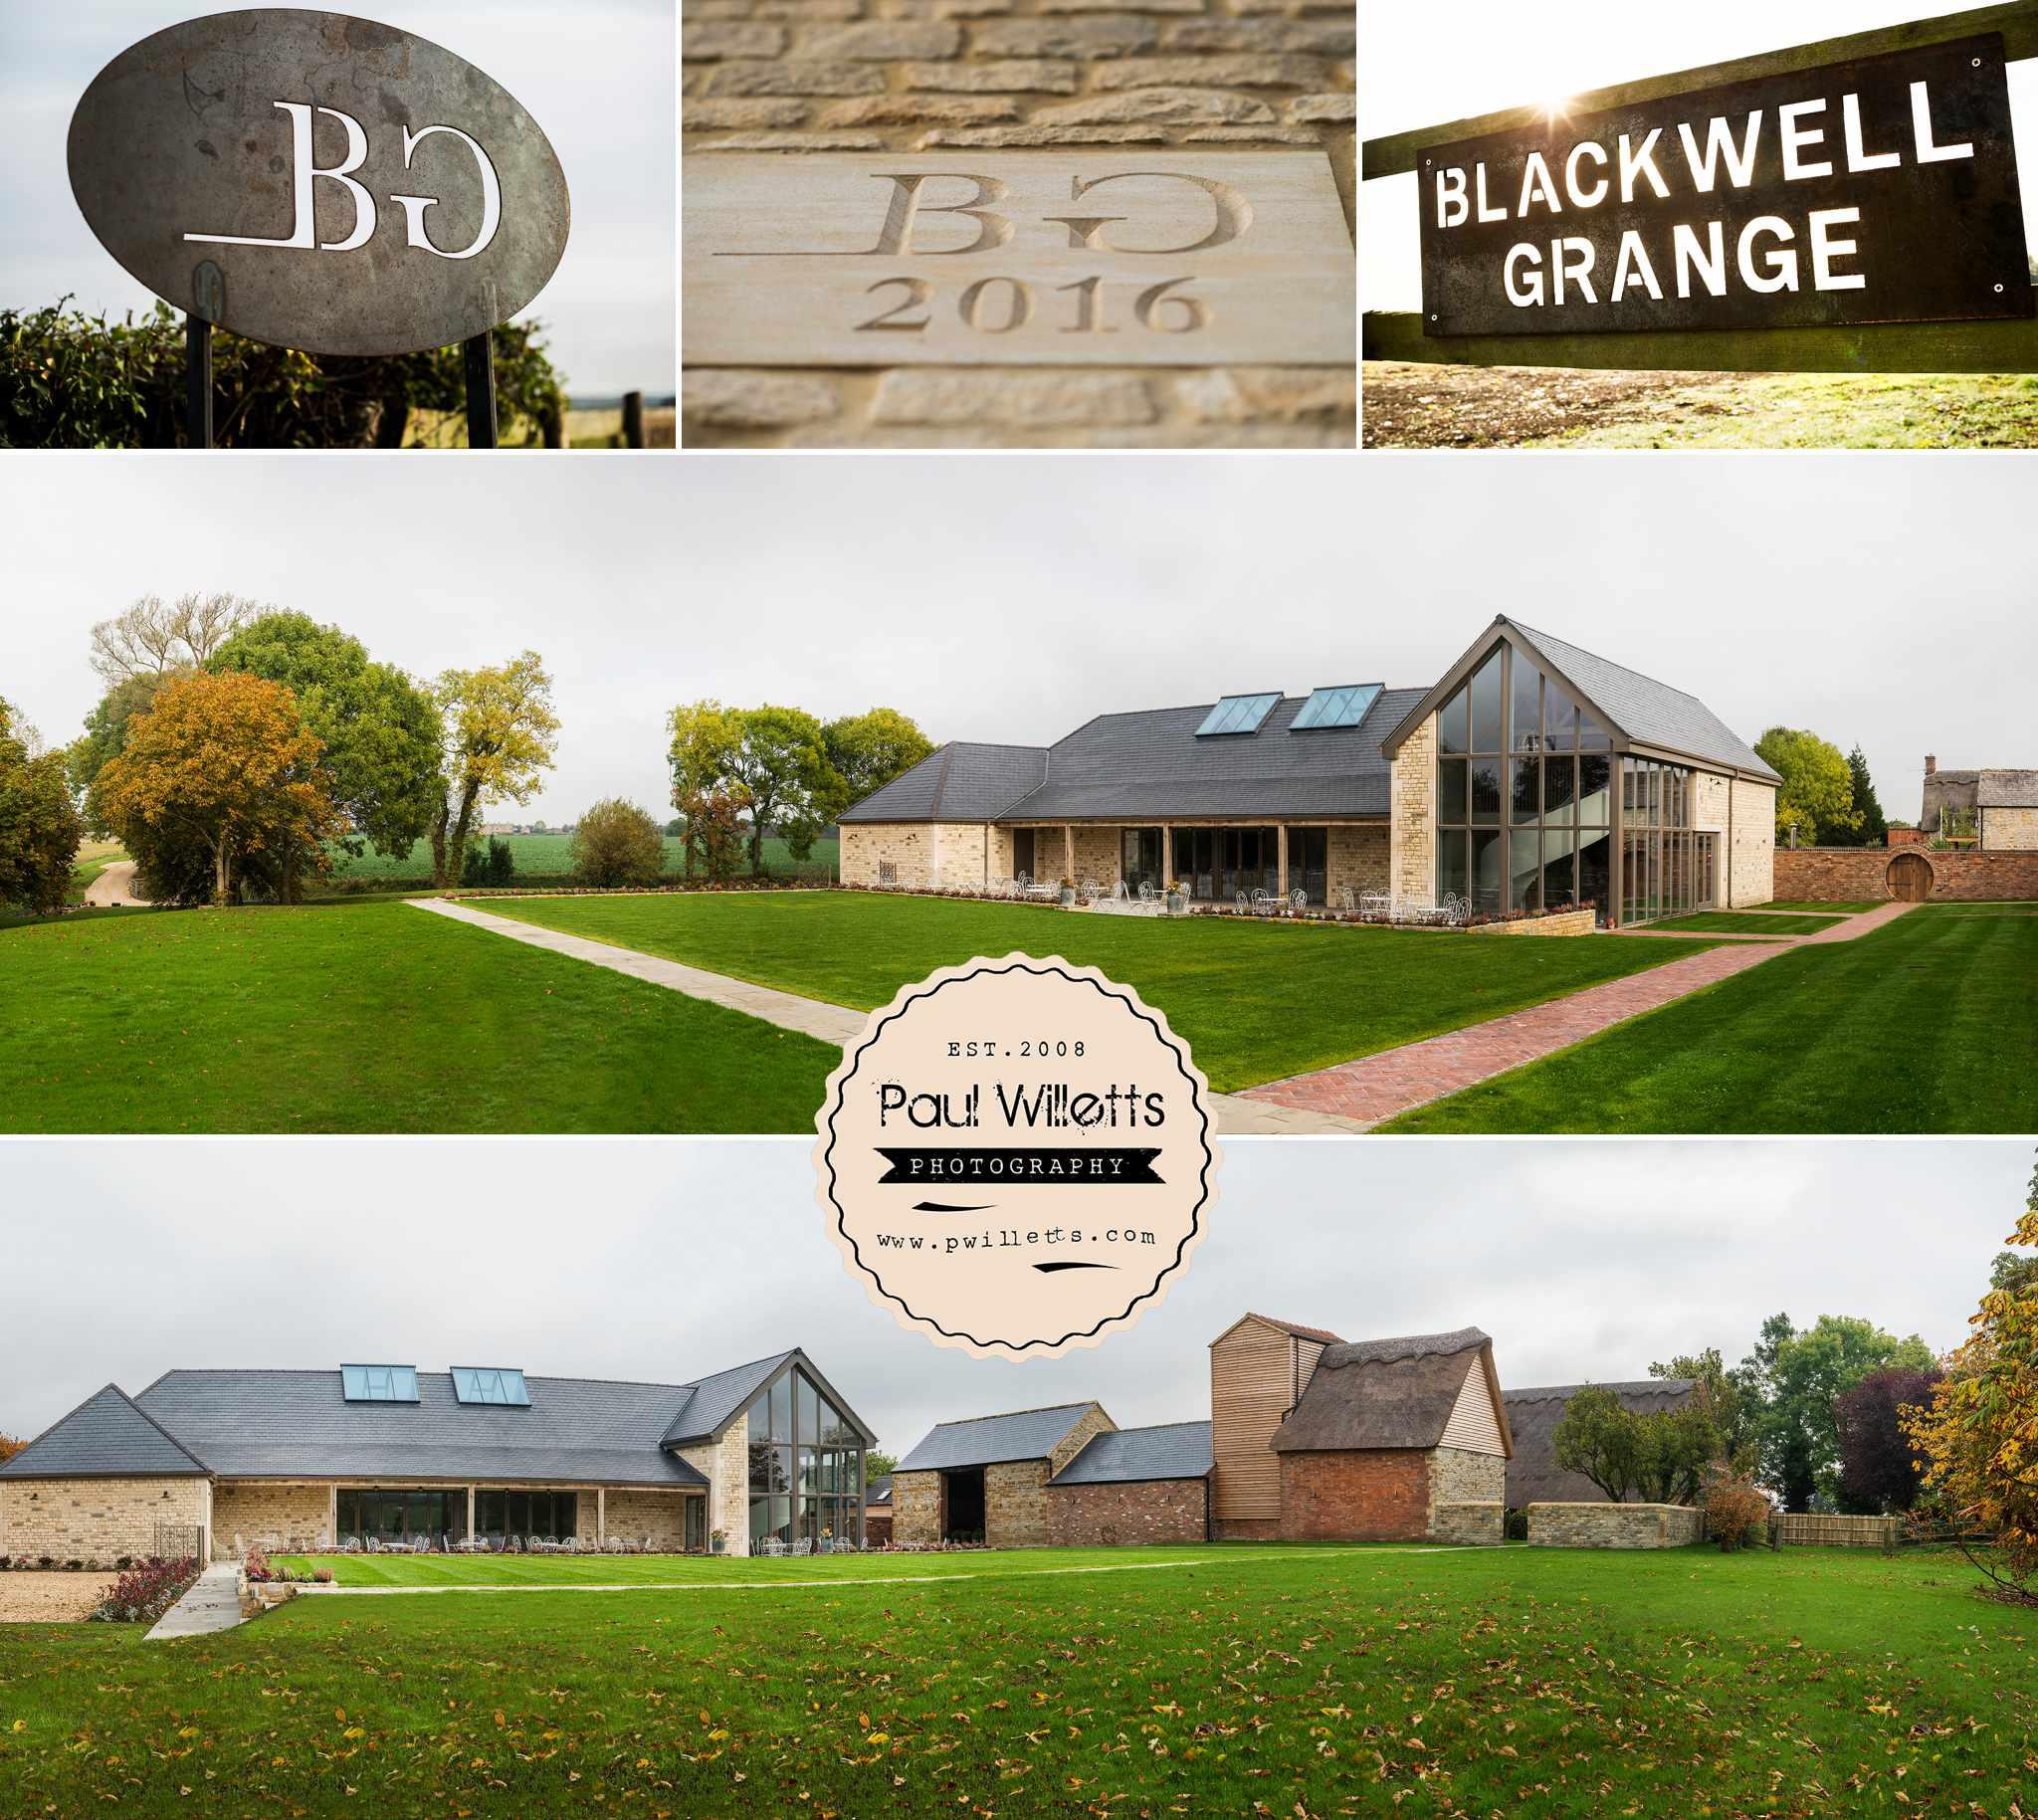 blackwell-grange-1